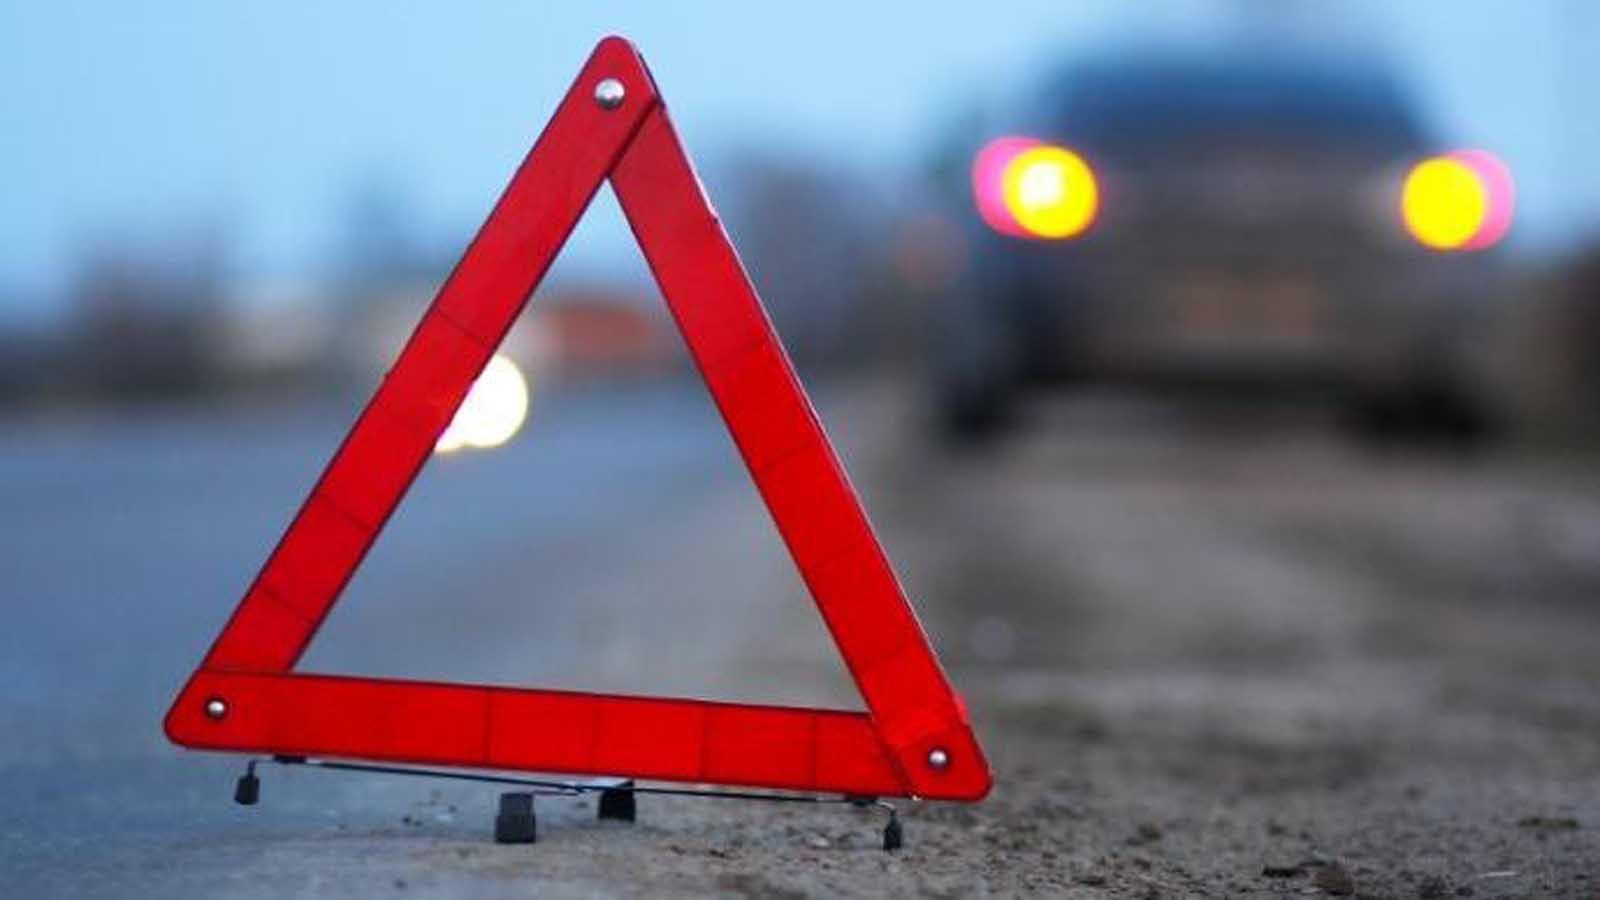 Вмассовом ДТП напроспекте Энтузиастов умер шофёр маршрутки